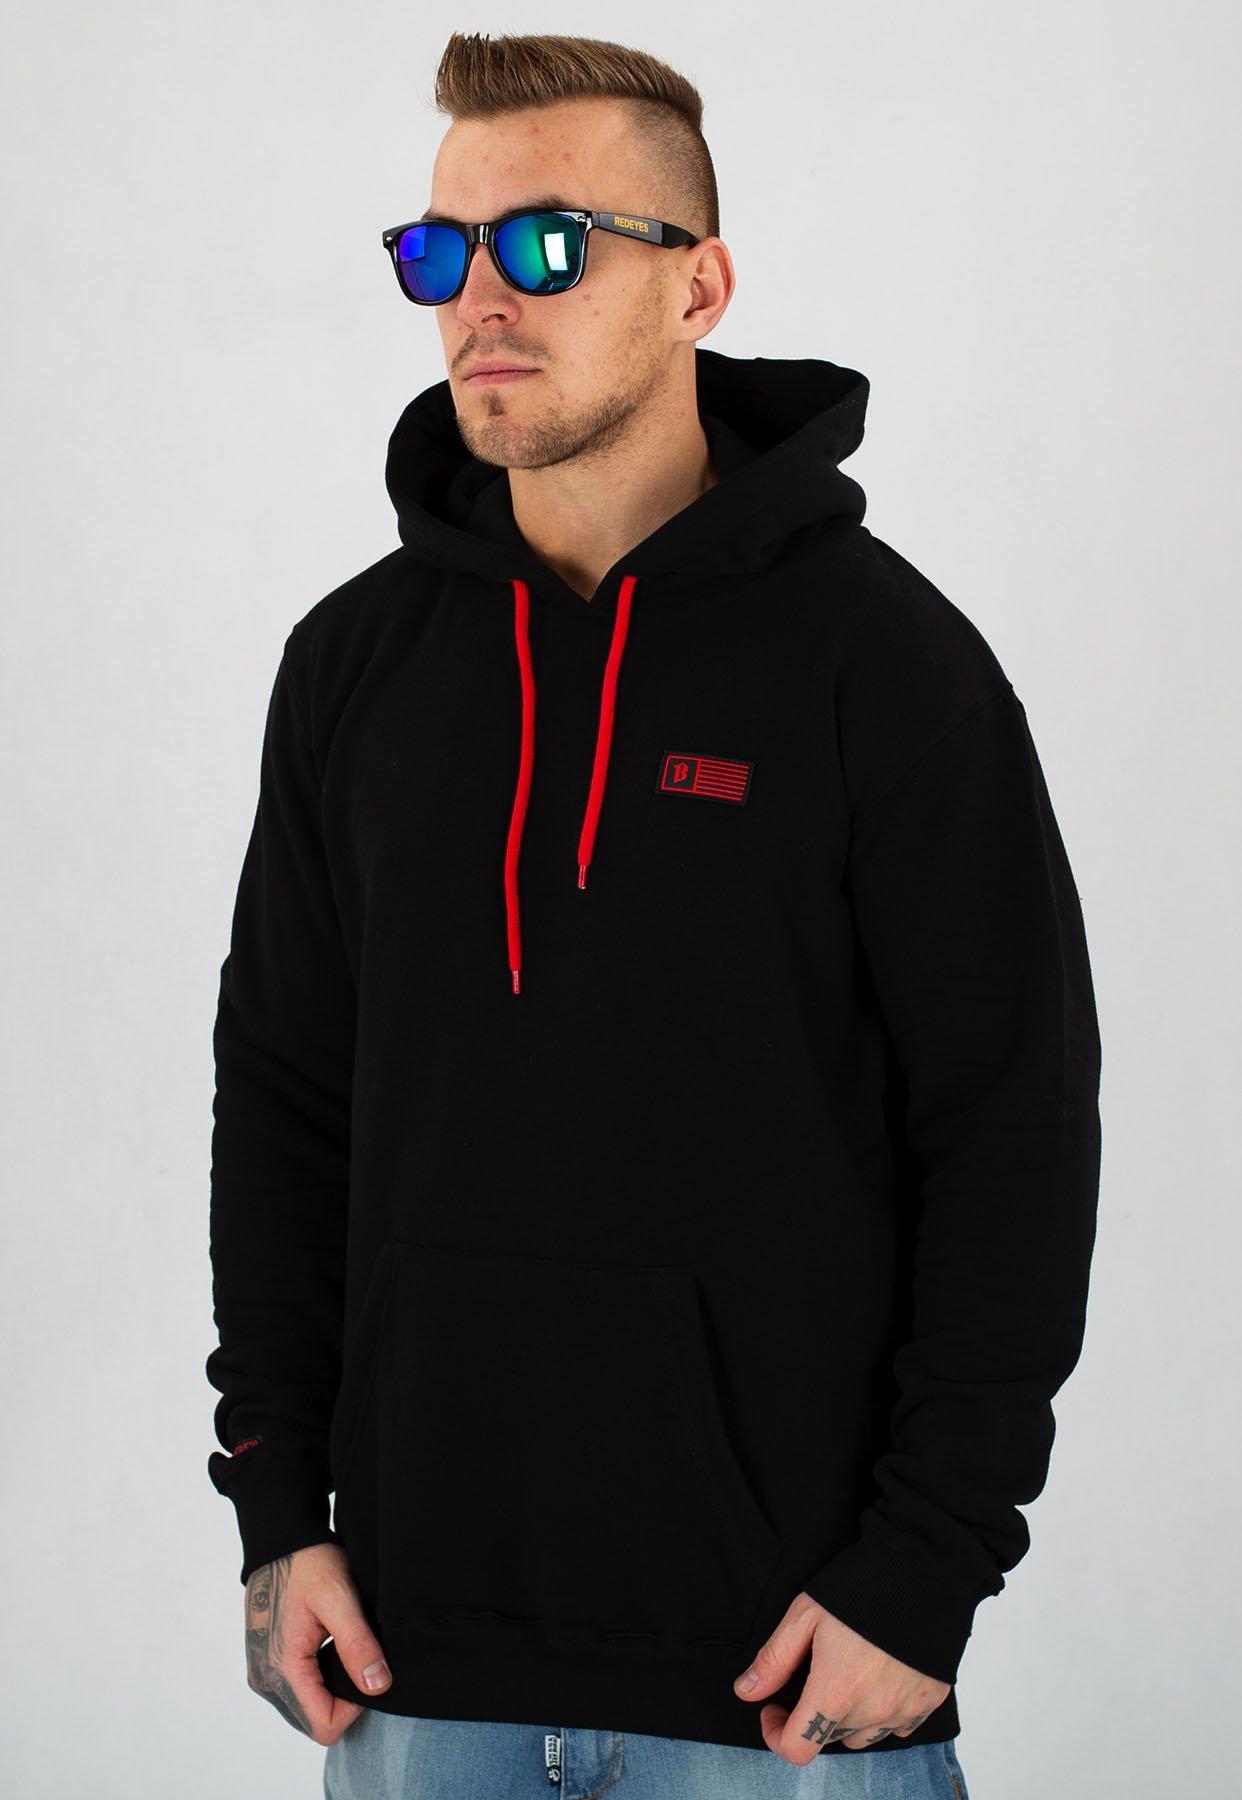 bluza męska z kapturem bor harley sport black s